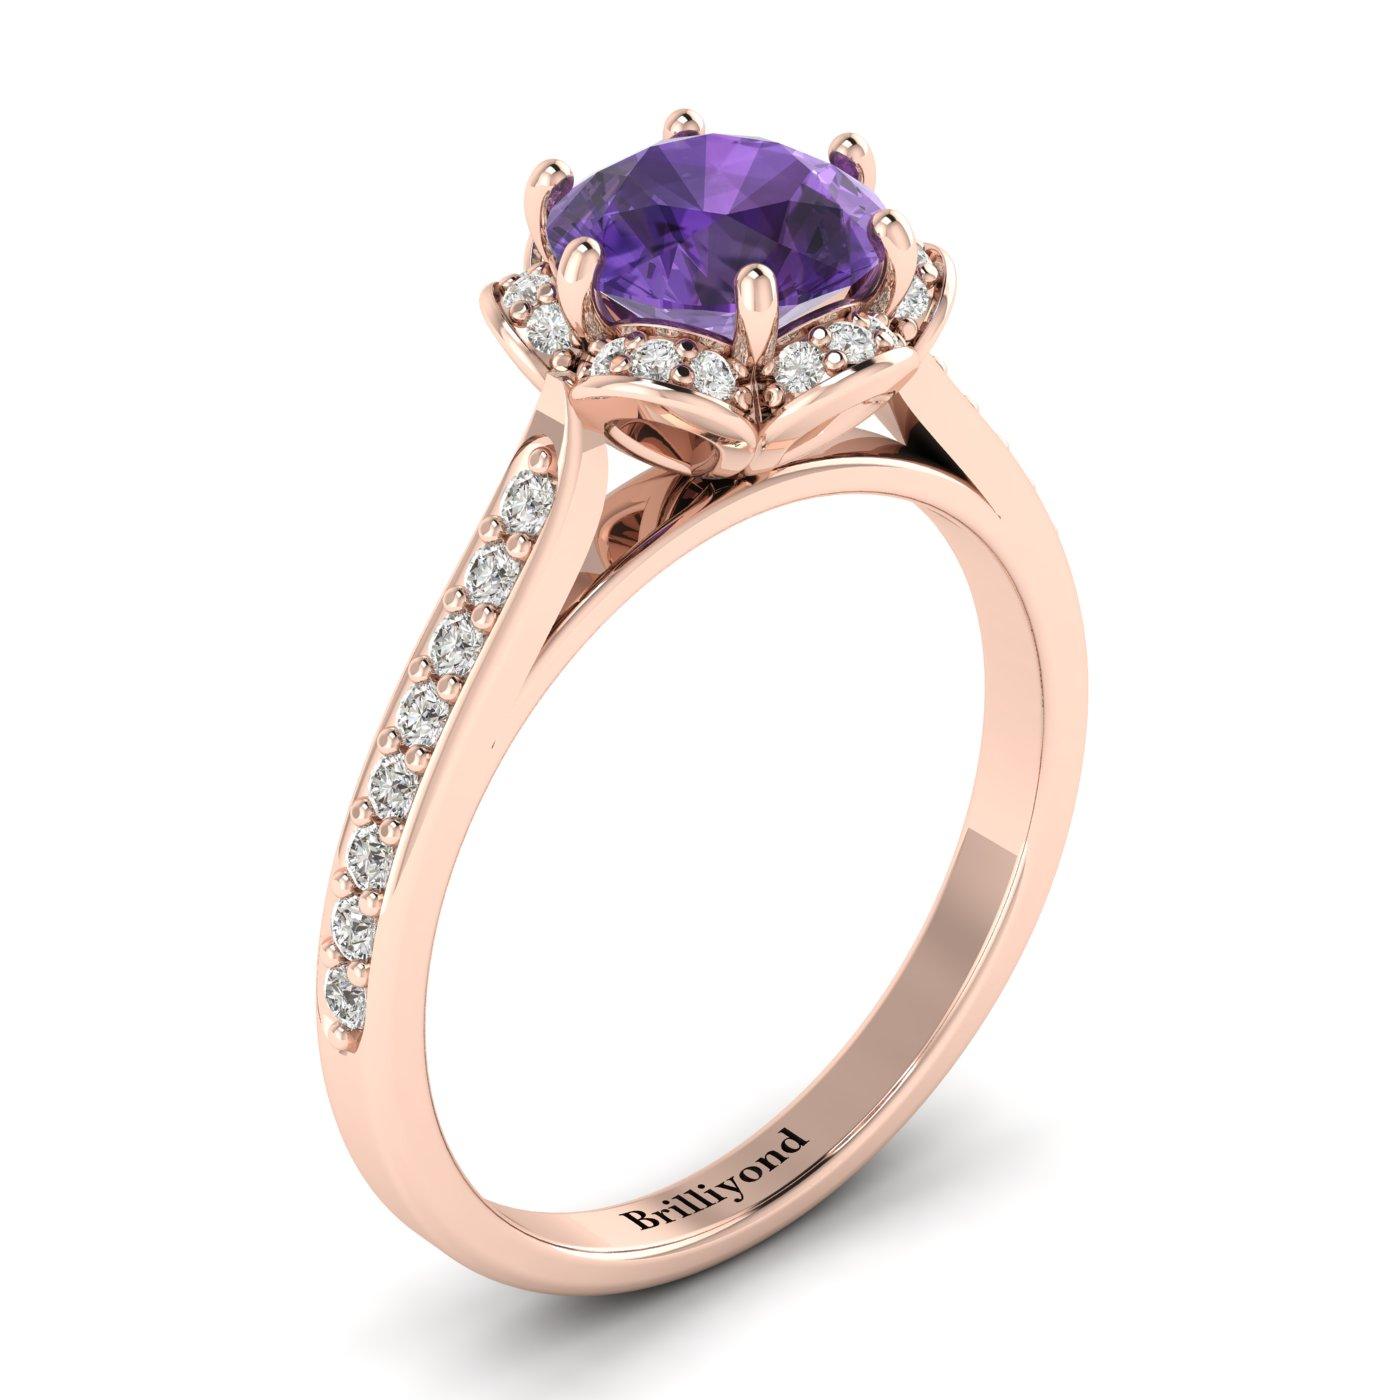 Amethyst Rose Gold Brilliant Cut Engagement Ring Rosebud_image2